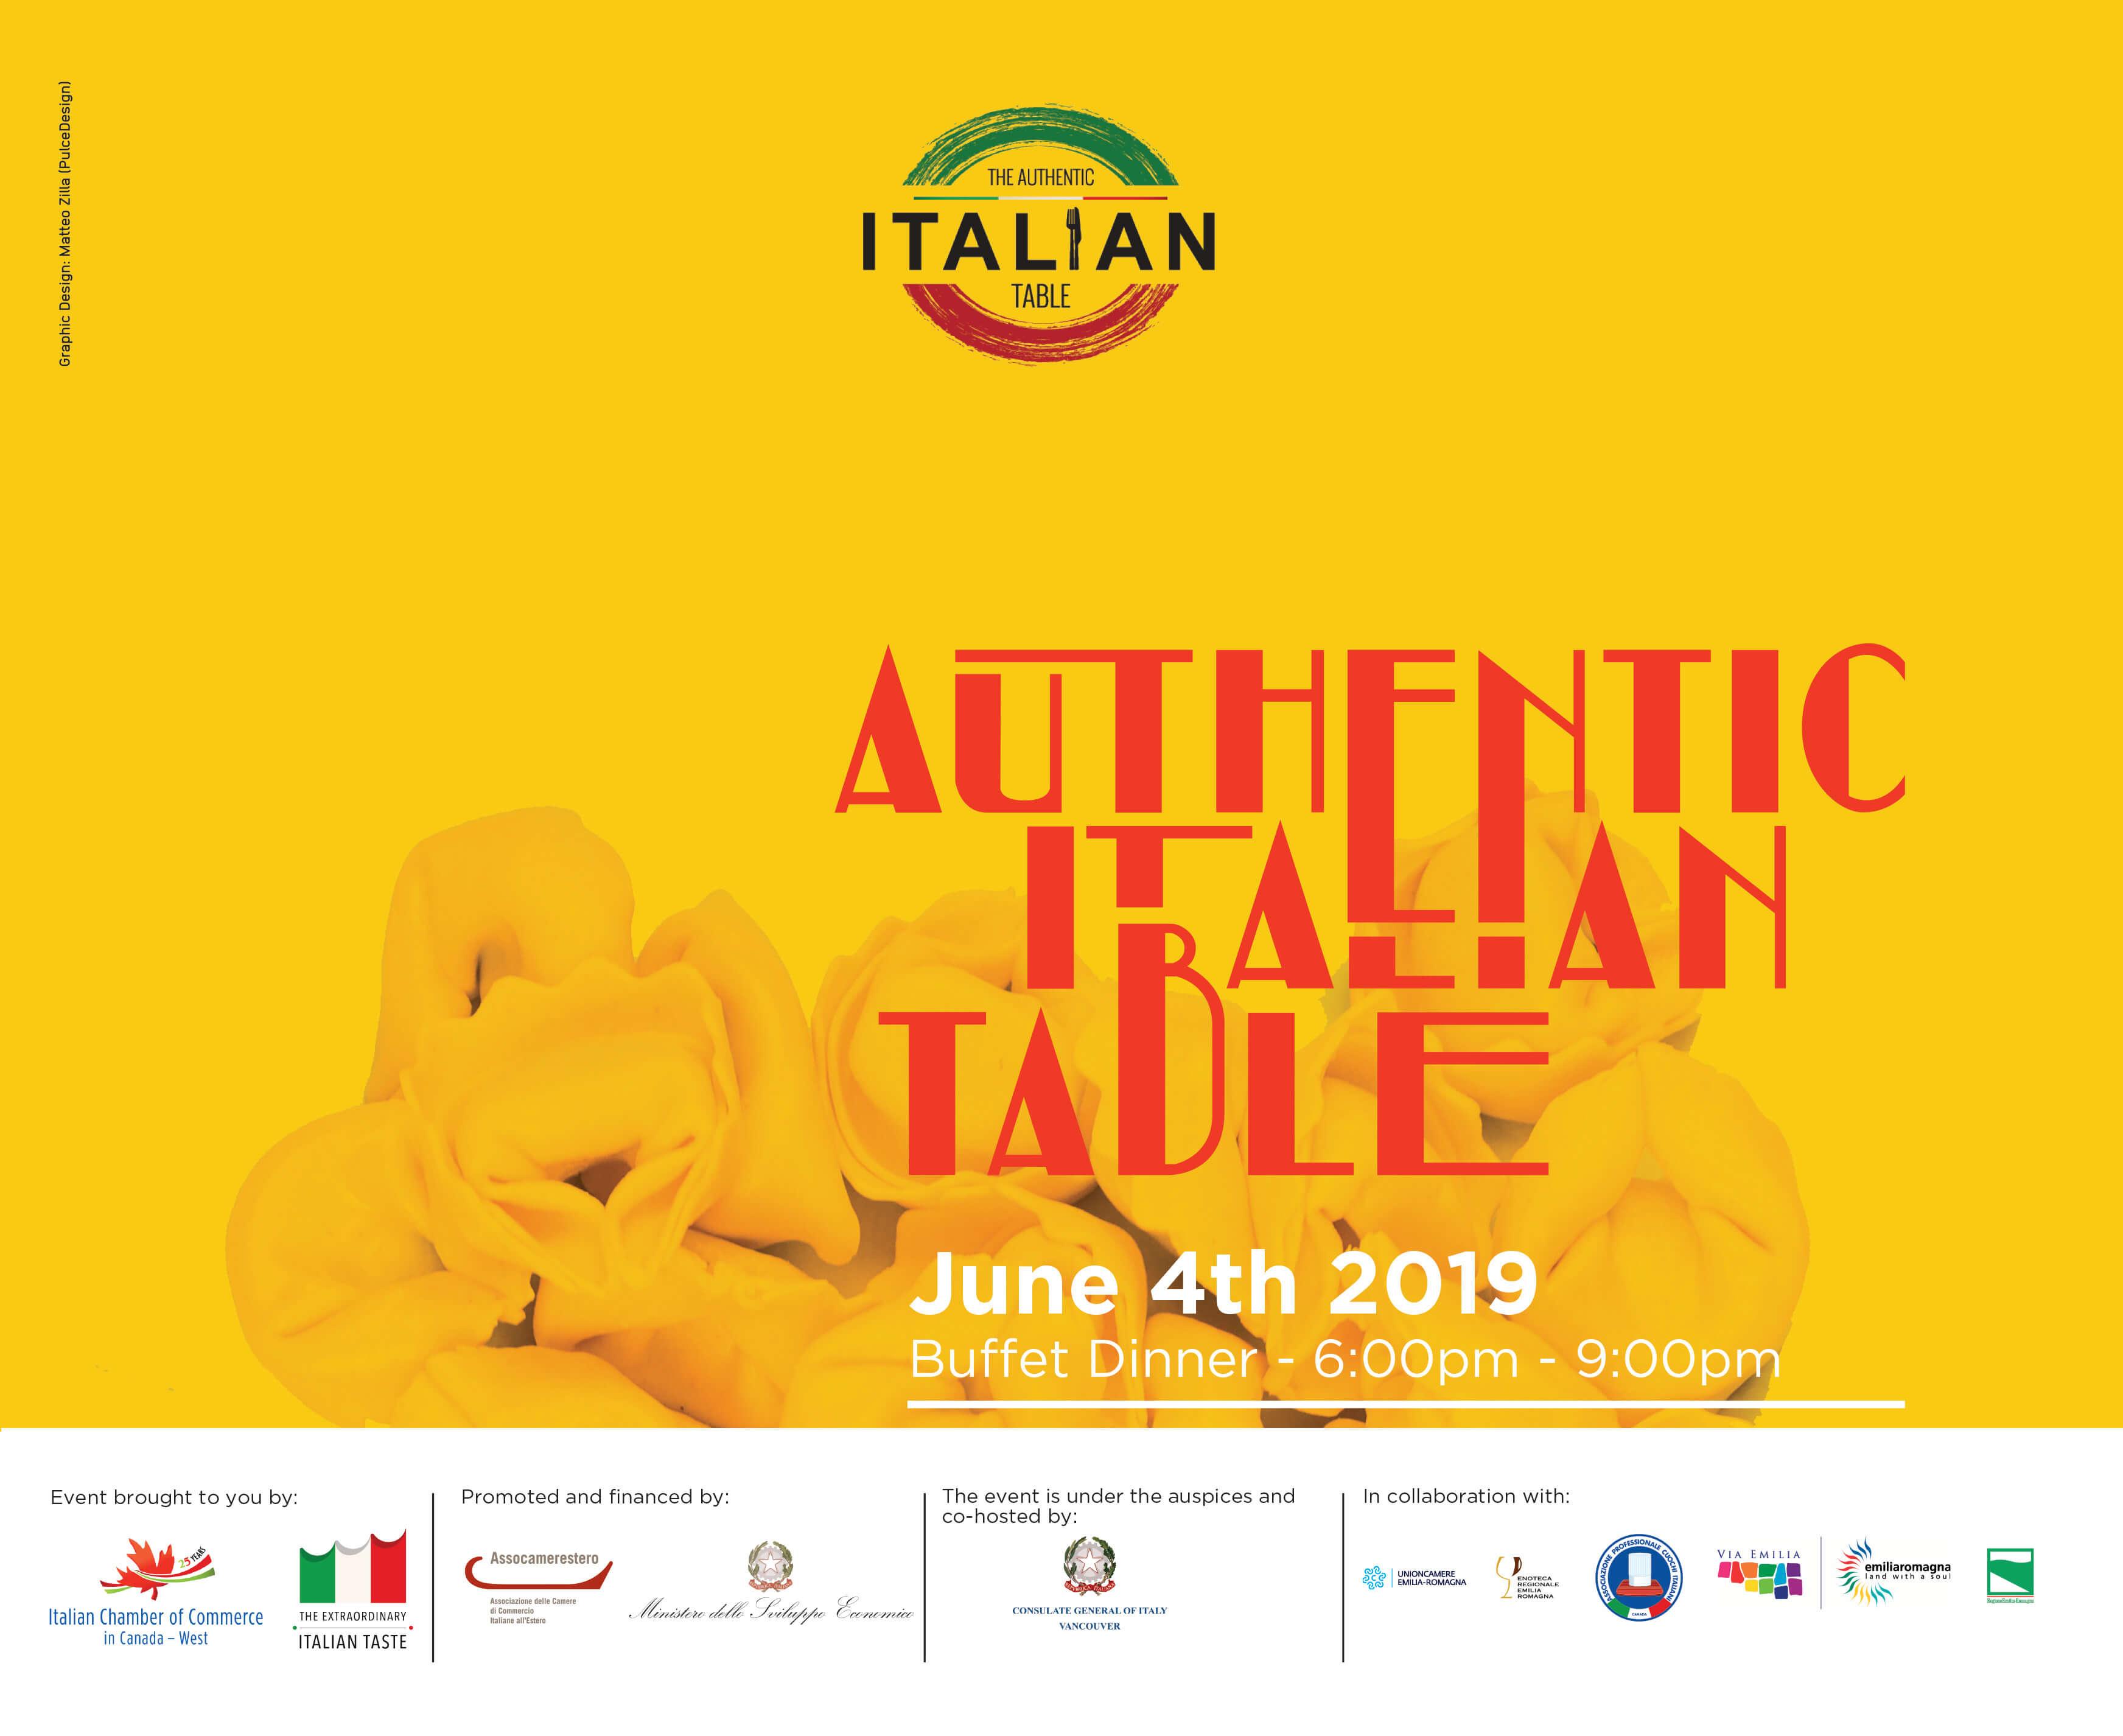 Authentic Italian Table Emilia Romagna Awards 2019